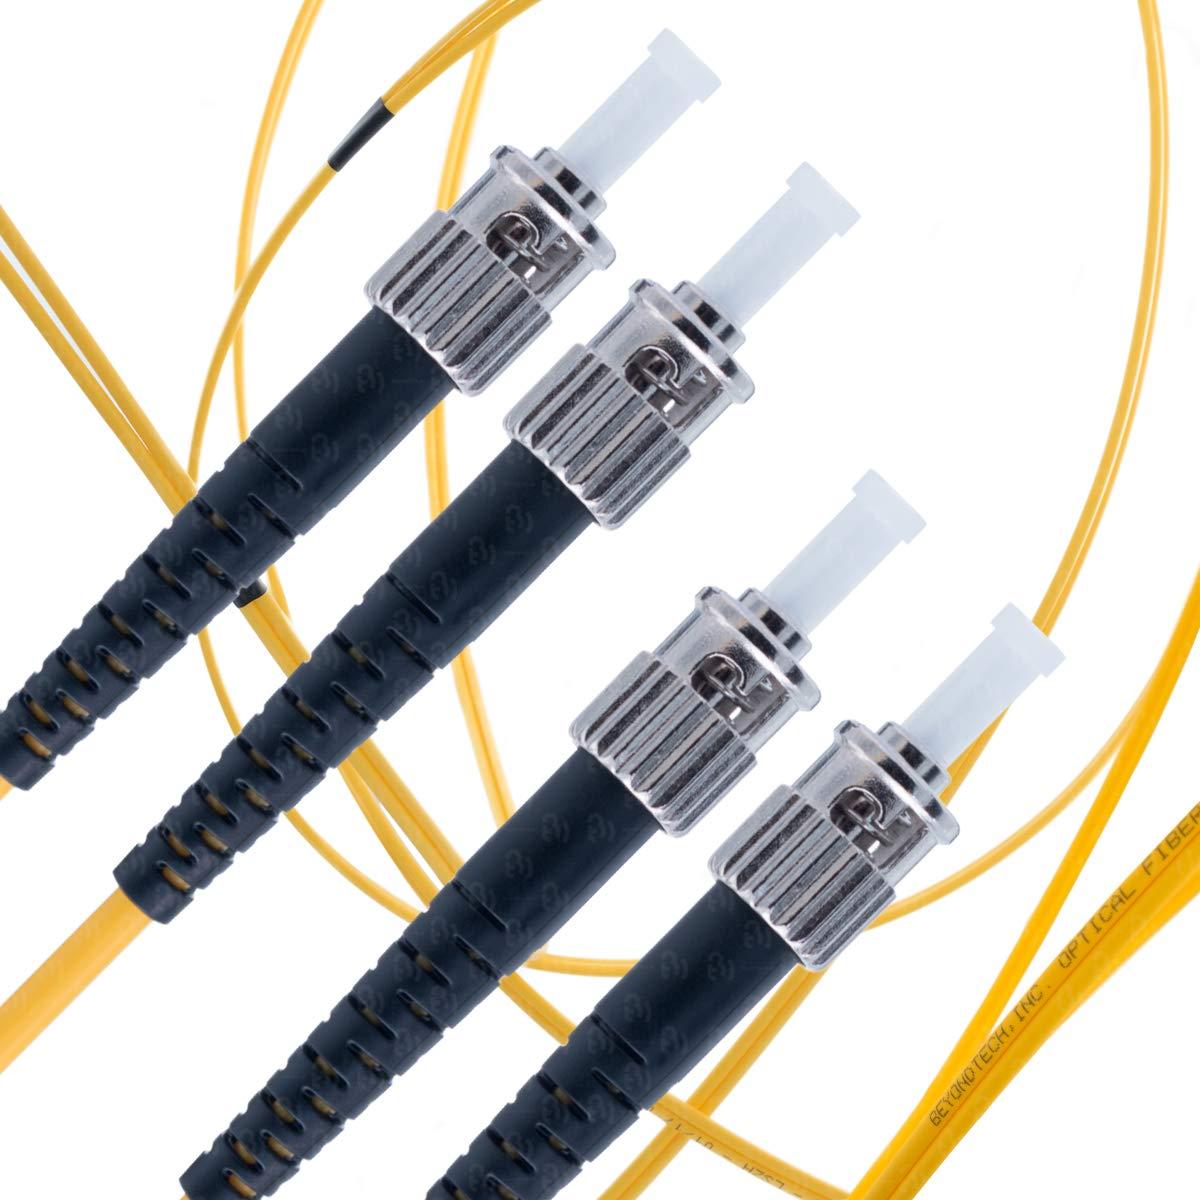 ST to ST Fiber Patch Cable Single Mode Duplex - 25m (82ft) - 9/125 OS1 - Beyondtech PureOptics Series